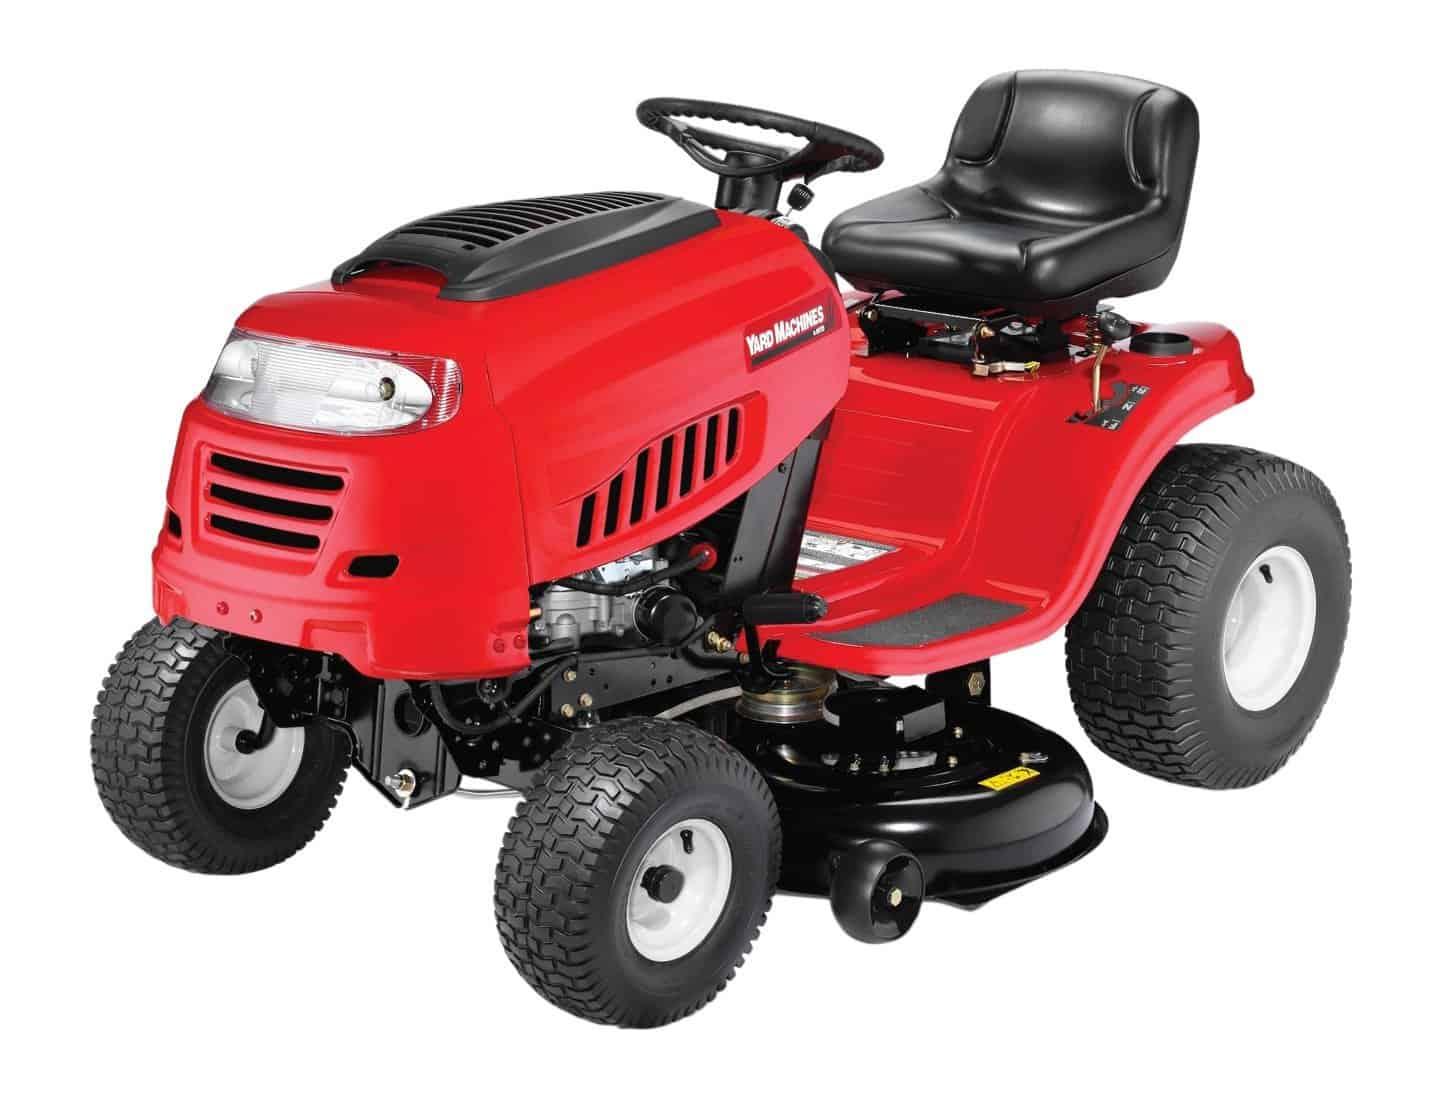 Yard Machines 420cc 42 Inch Riding